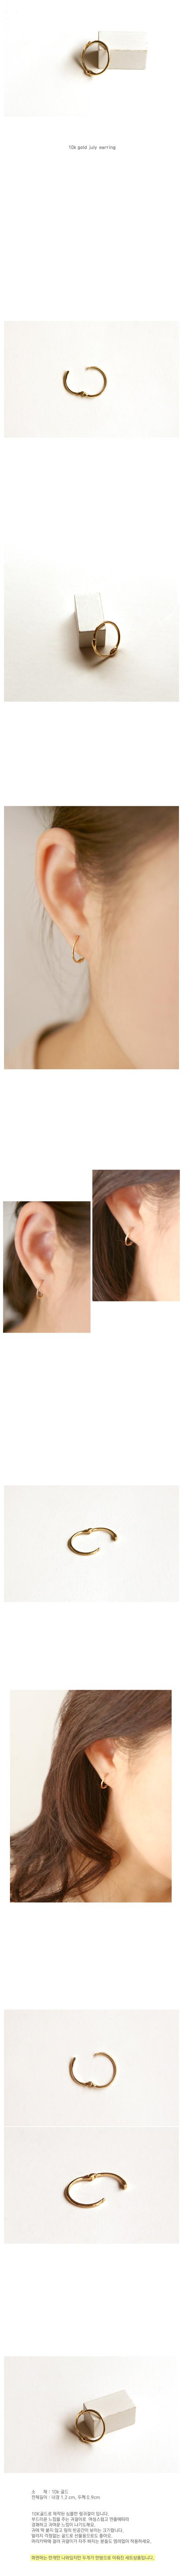 10k gold july earring - 녹다, 62,000원, 골드, 링귀걸이